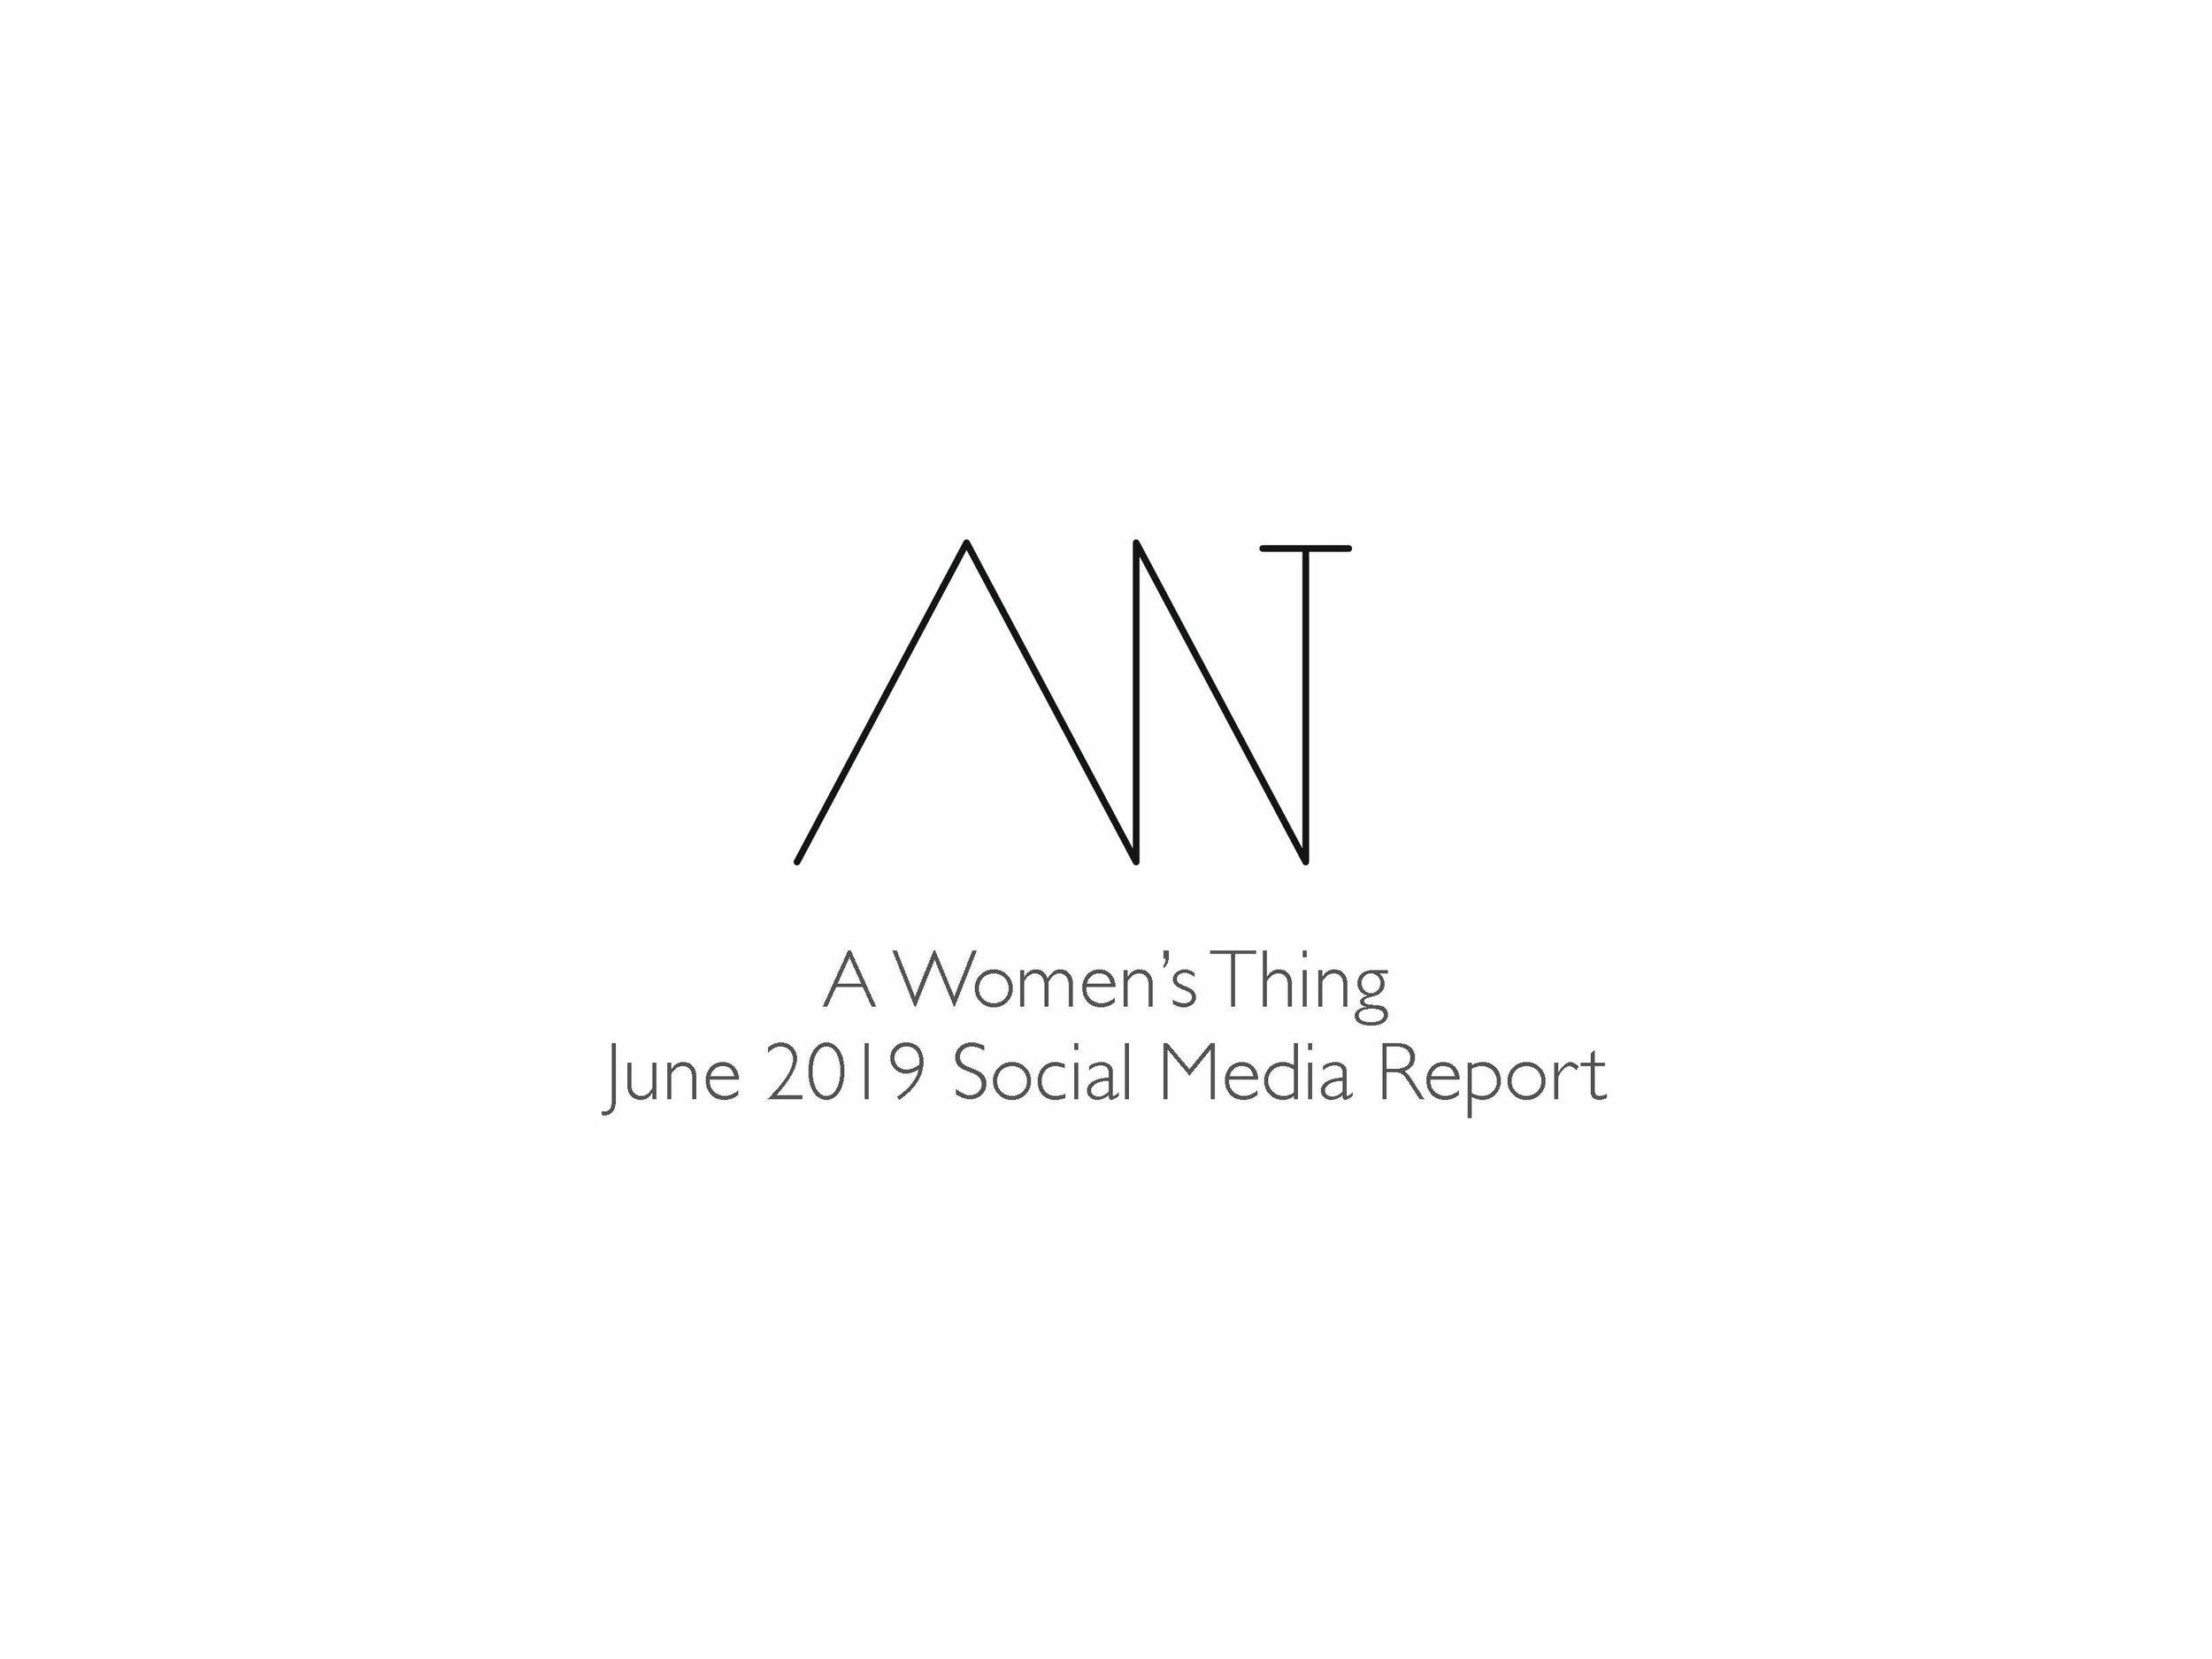 Click through for a social media brand case study.